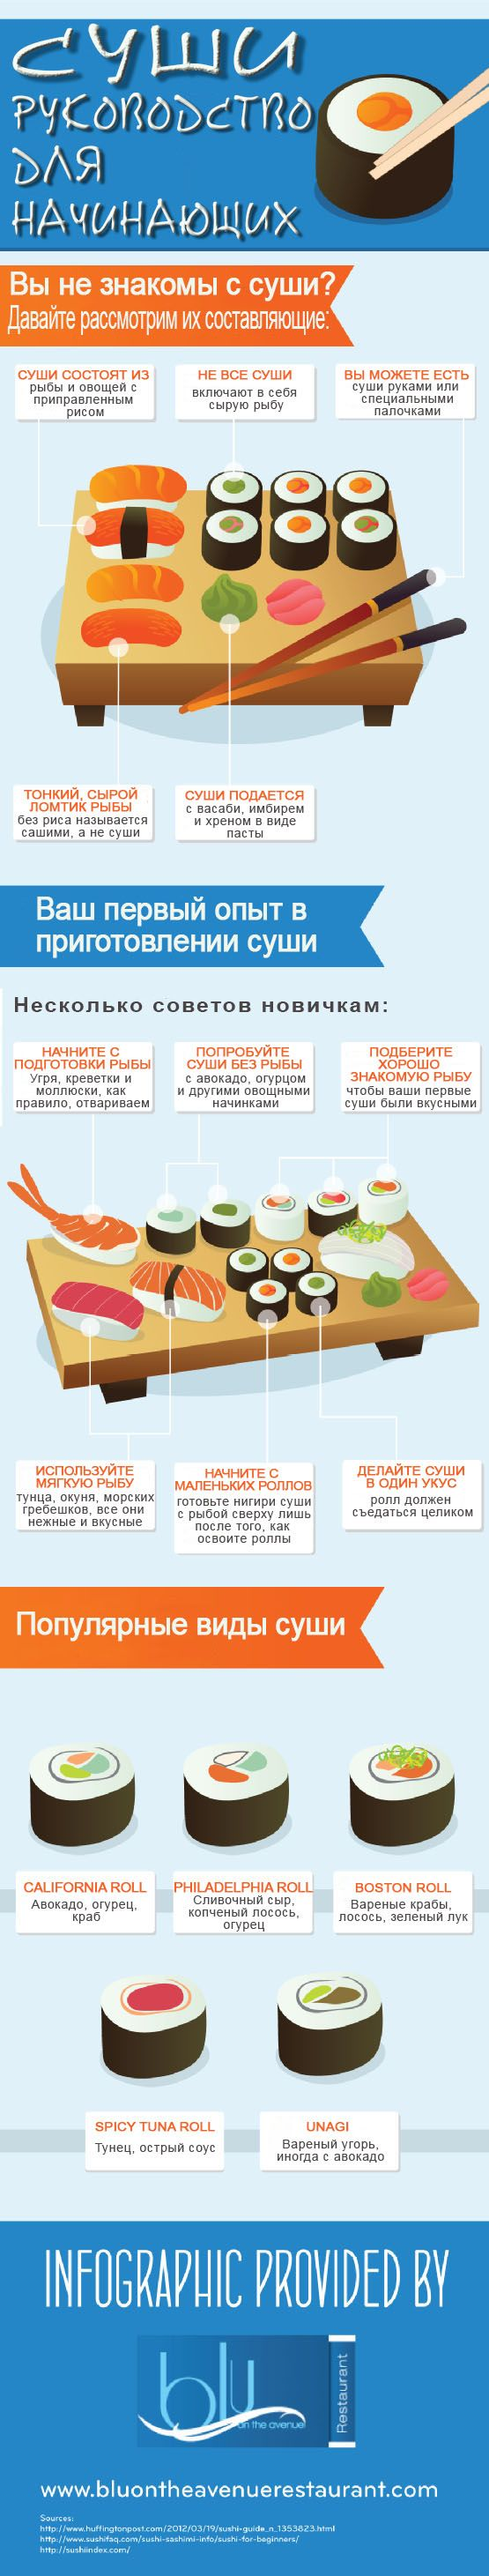 Инфографика о том, как приготовить суши. #edimdoma #infographics #cookery